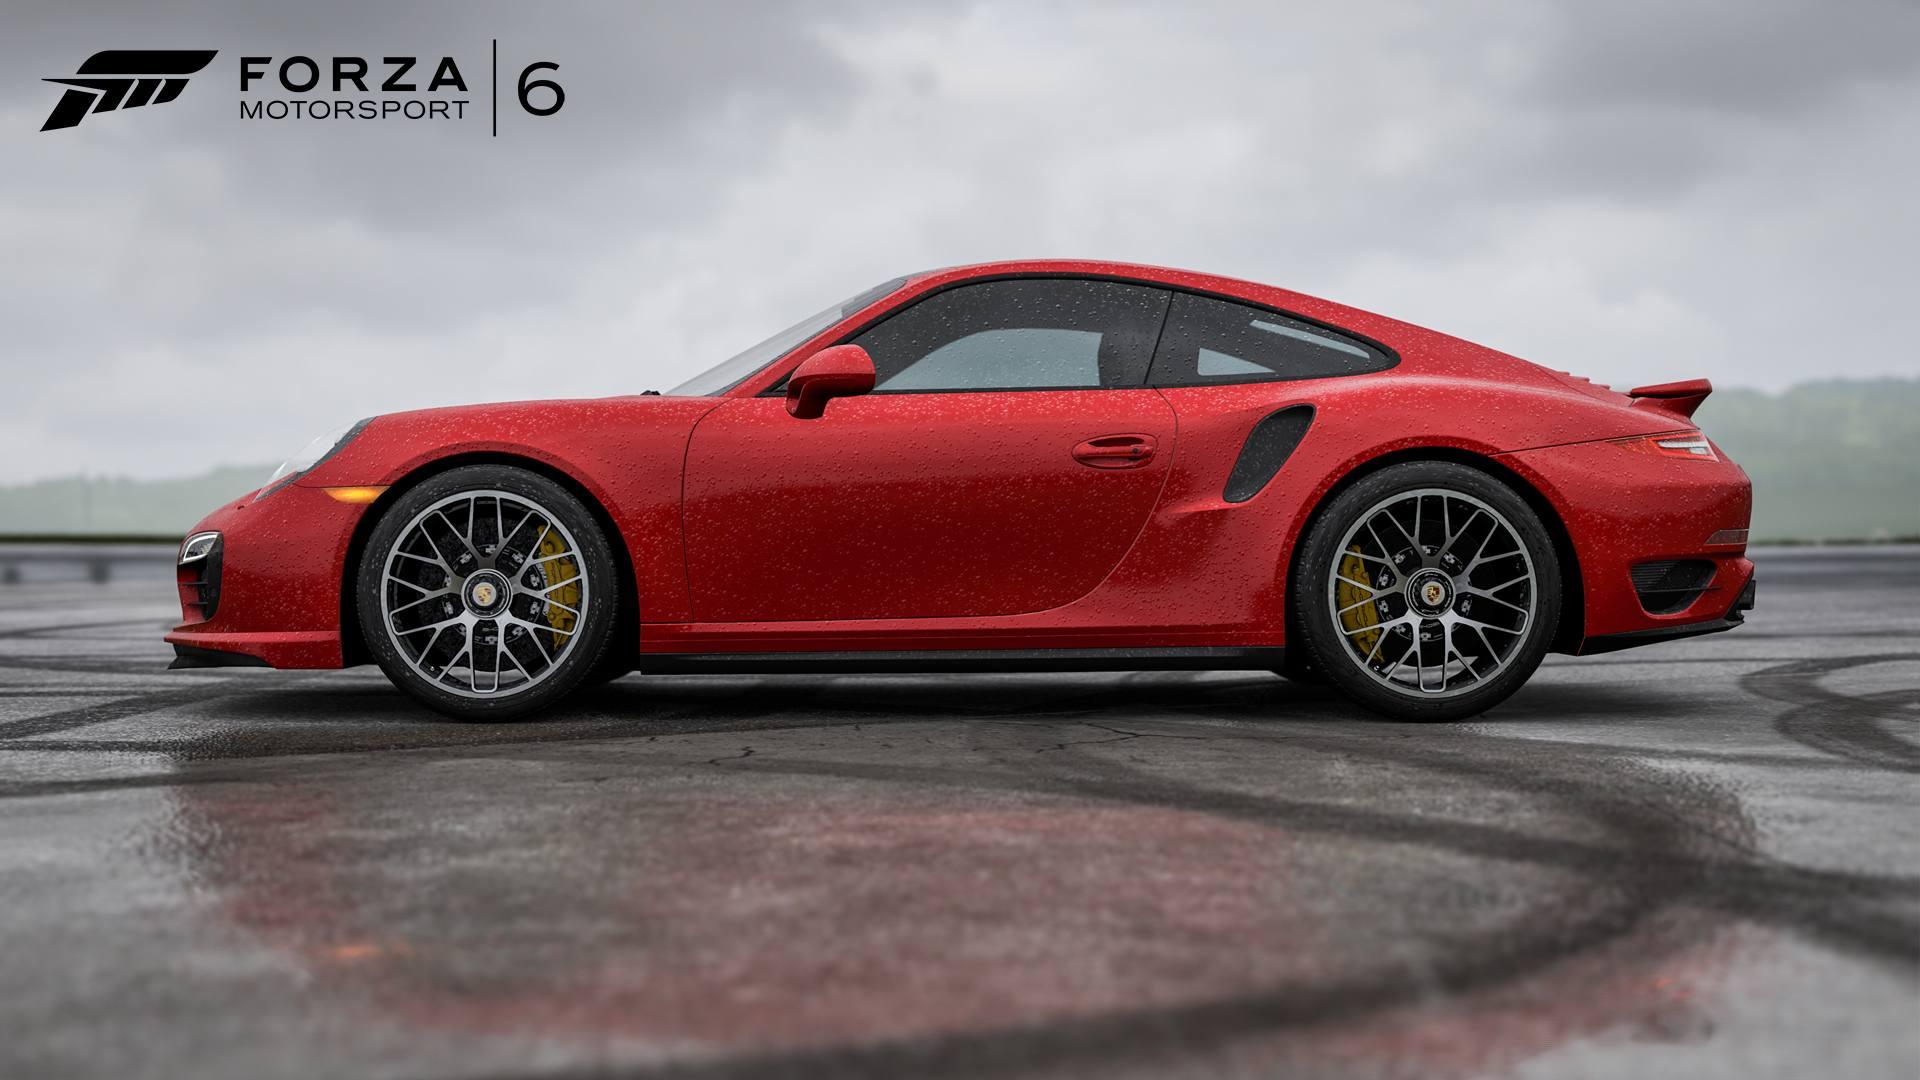 Forza Motorsport 6 01-03-16 2014 Porsche 911 Turbo S